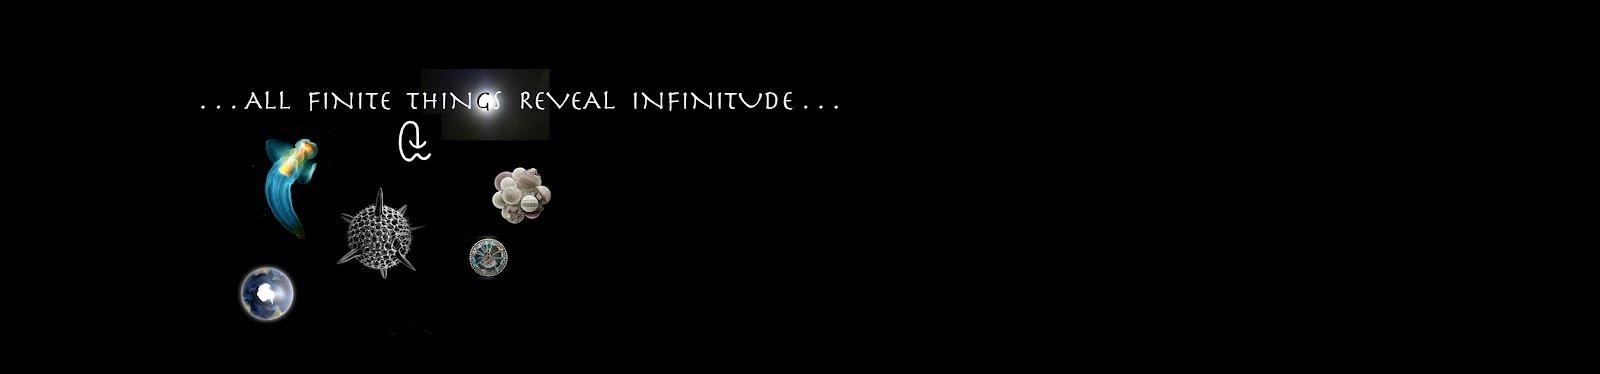 . . . All Finite Things Reveal Infinitude . . .